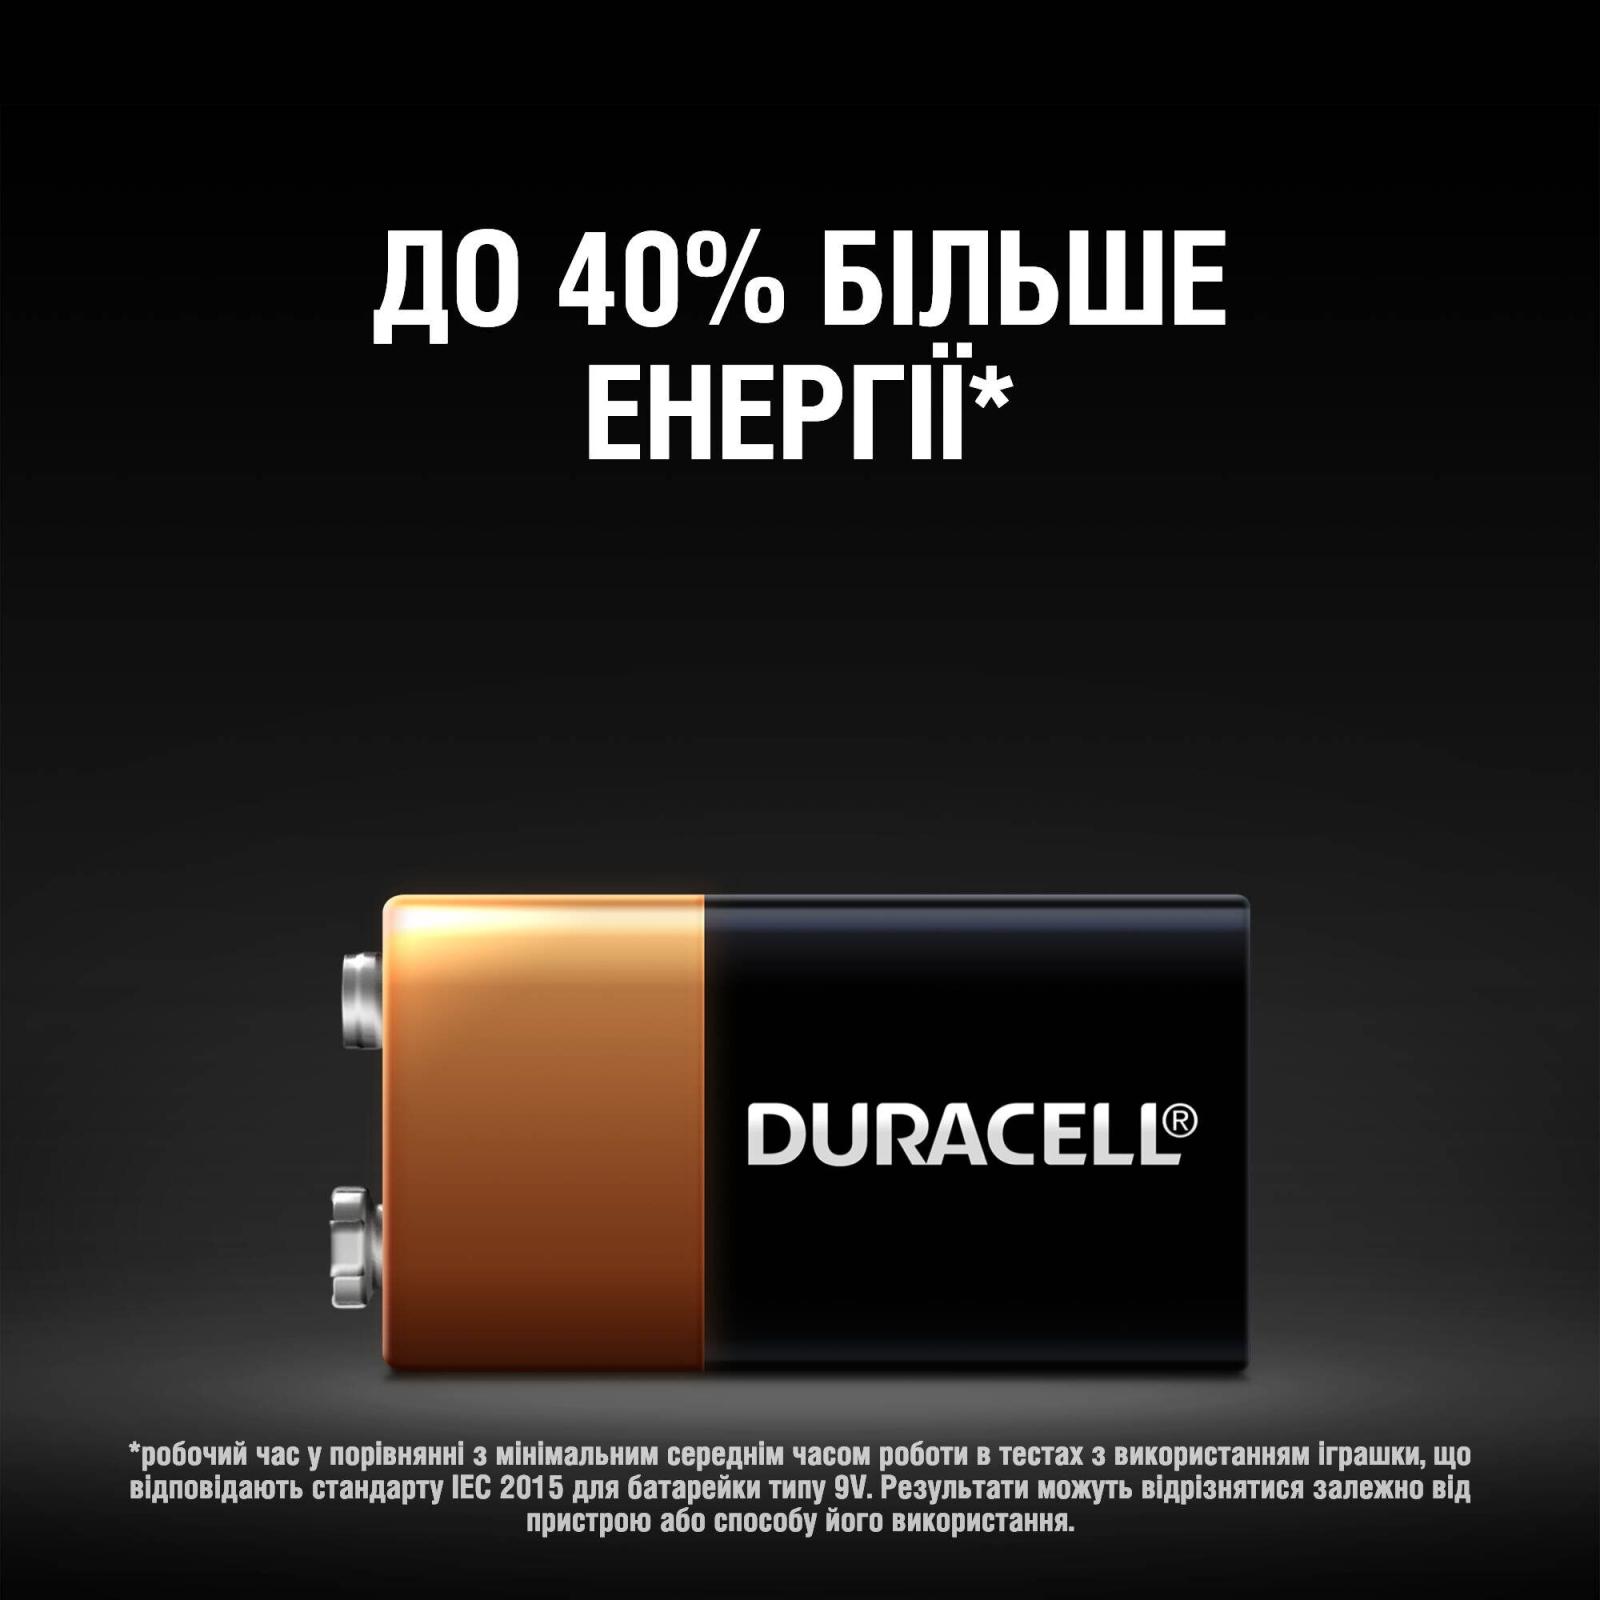 Батарейка Крона 9V * 1 Duracell (5000394066267 / 81483681) изображение 4